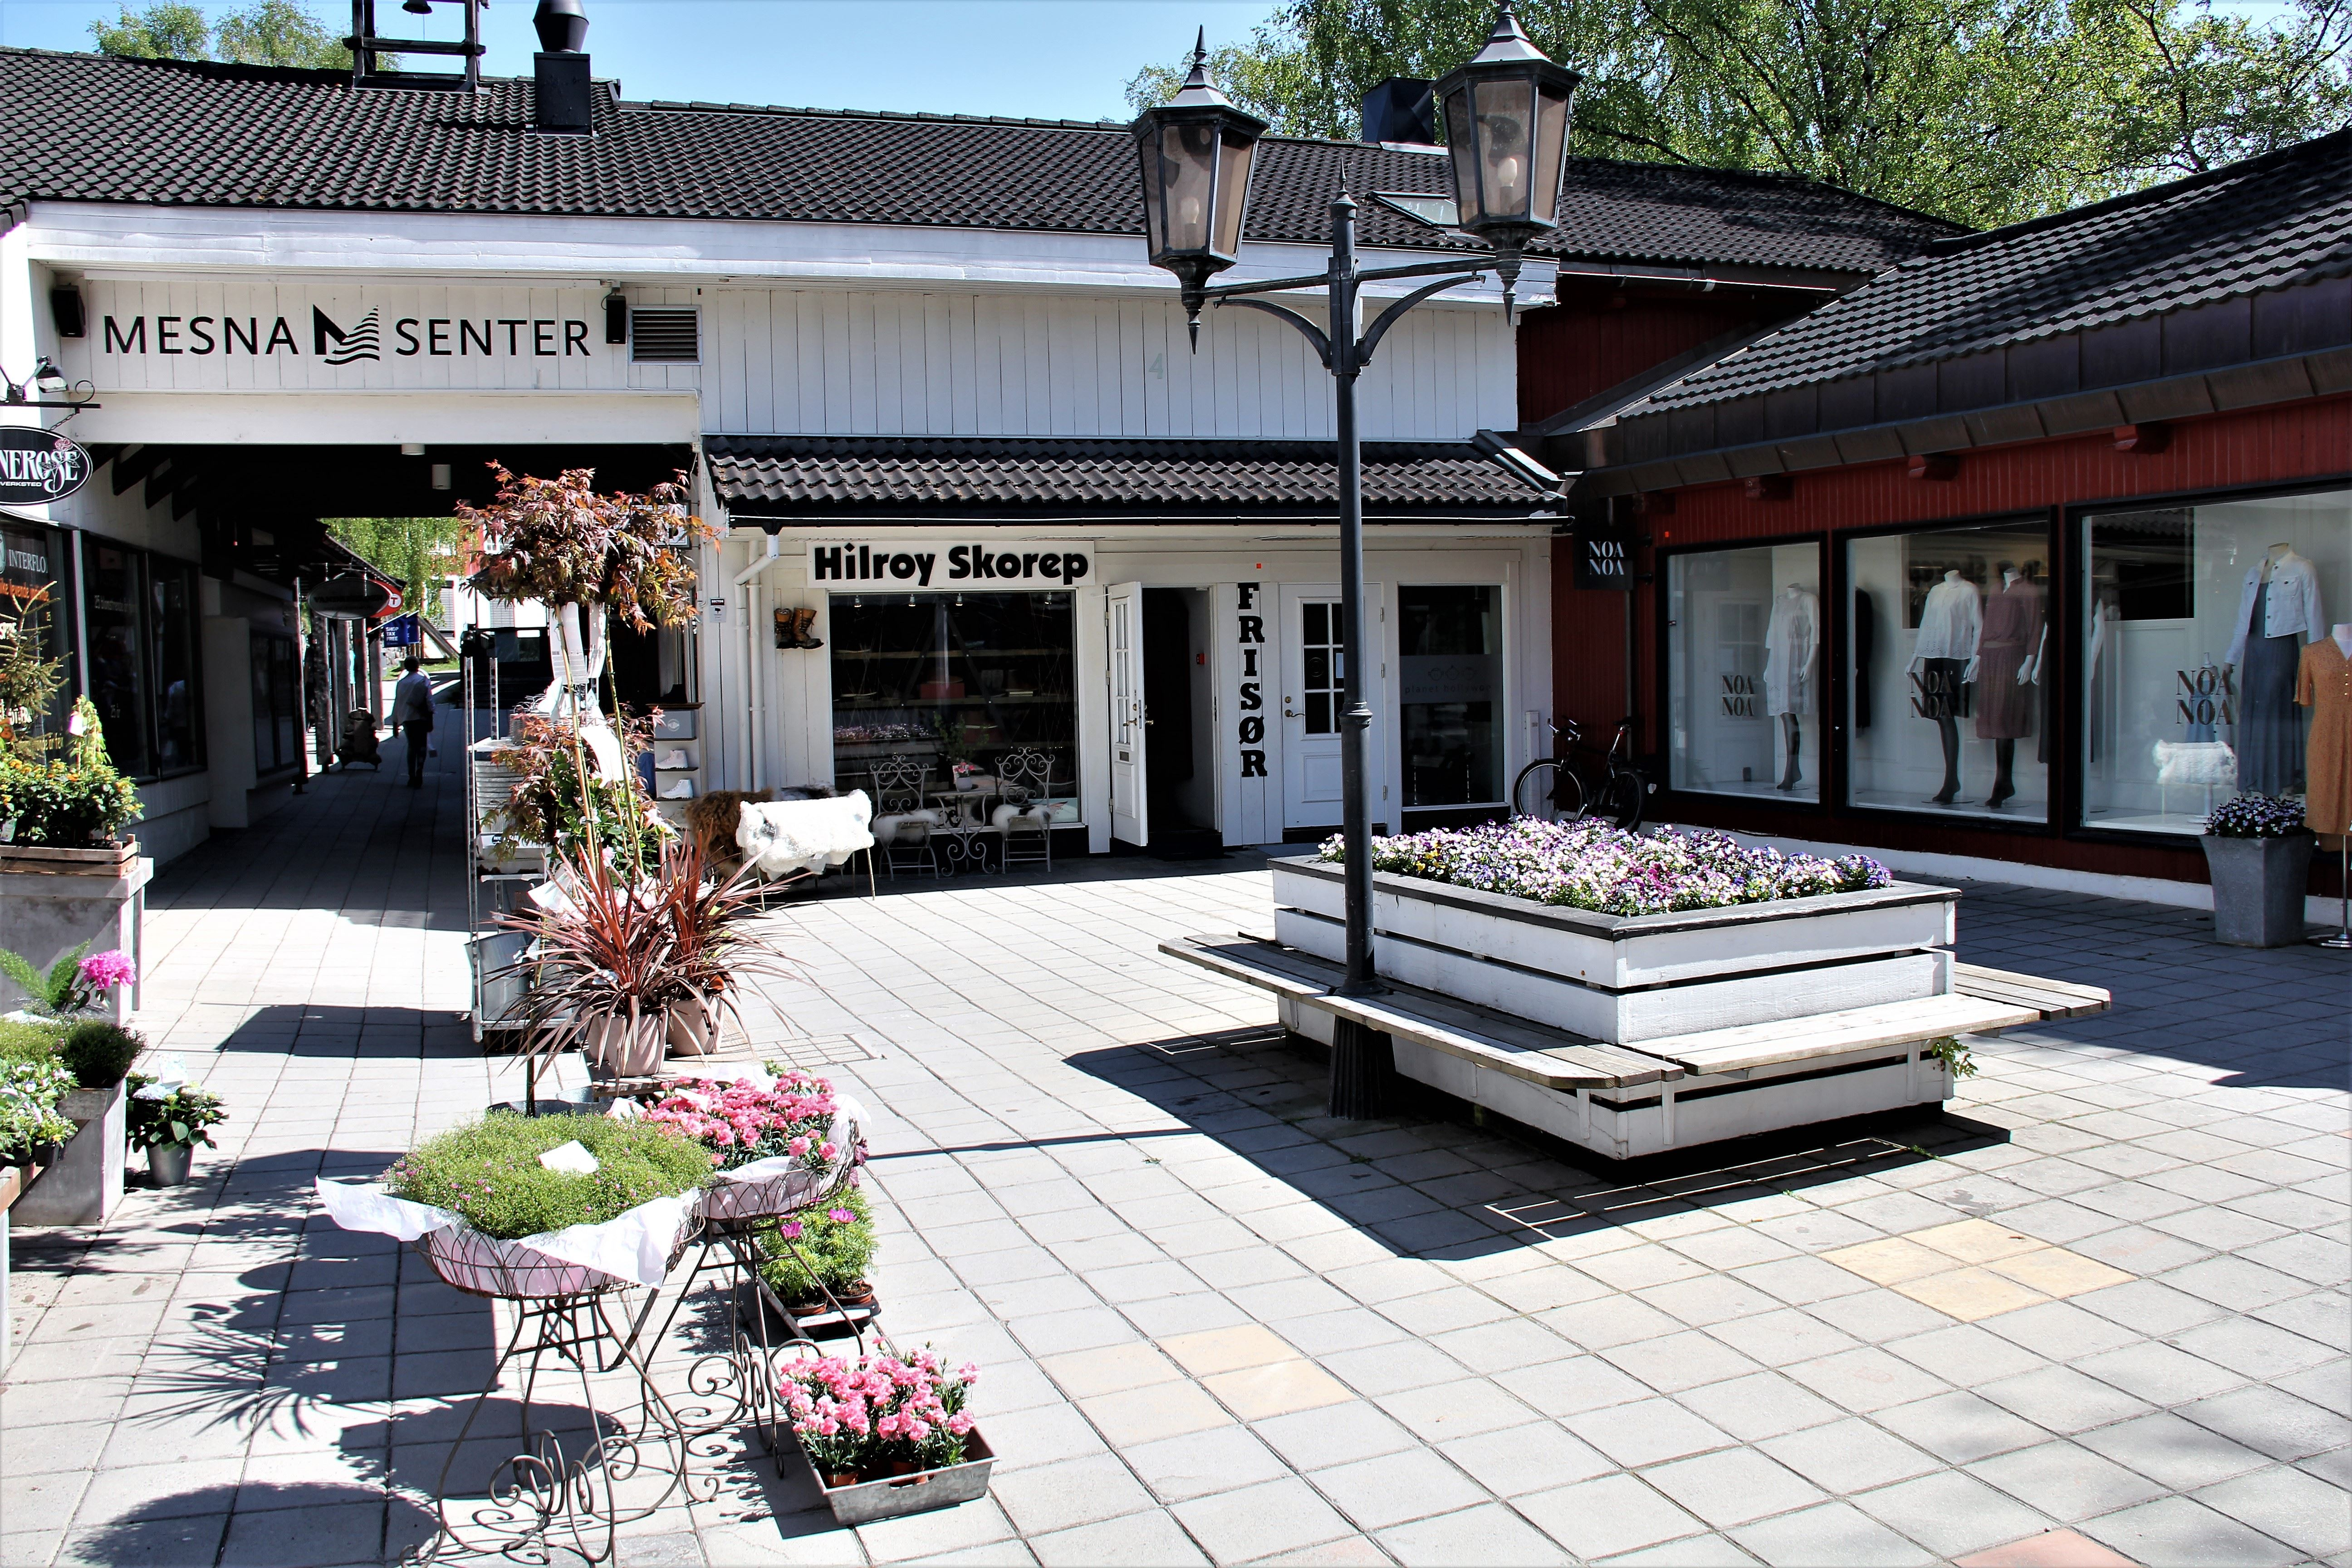 Shoemaker in Lillehammer